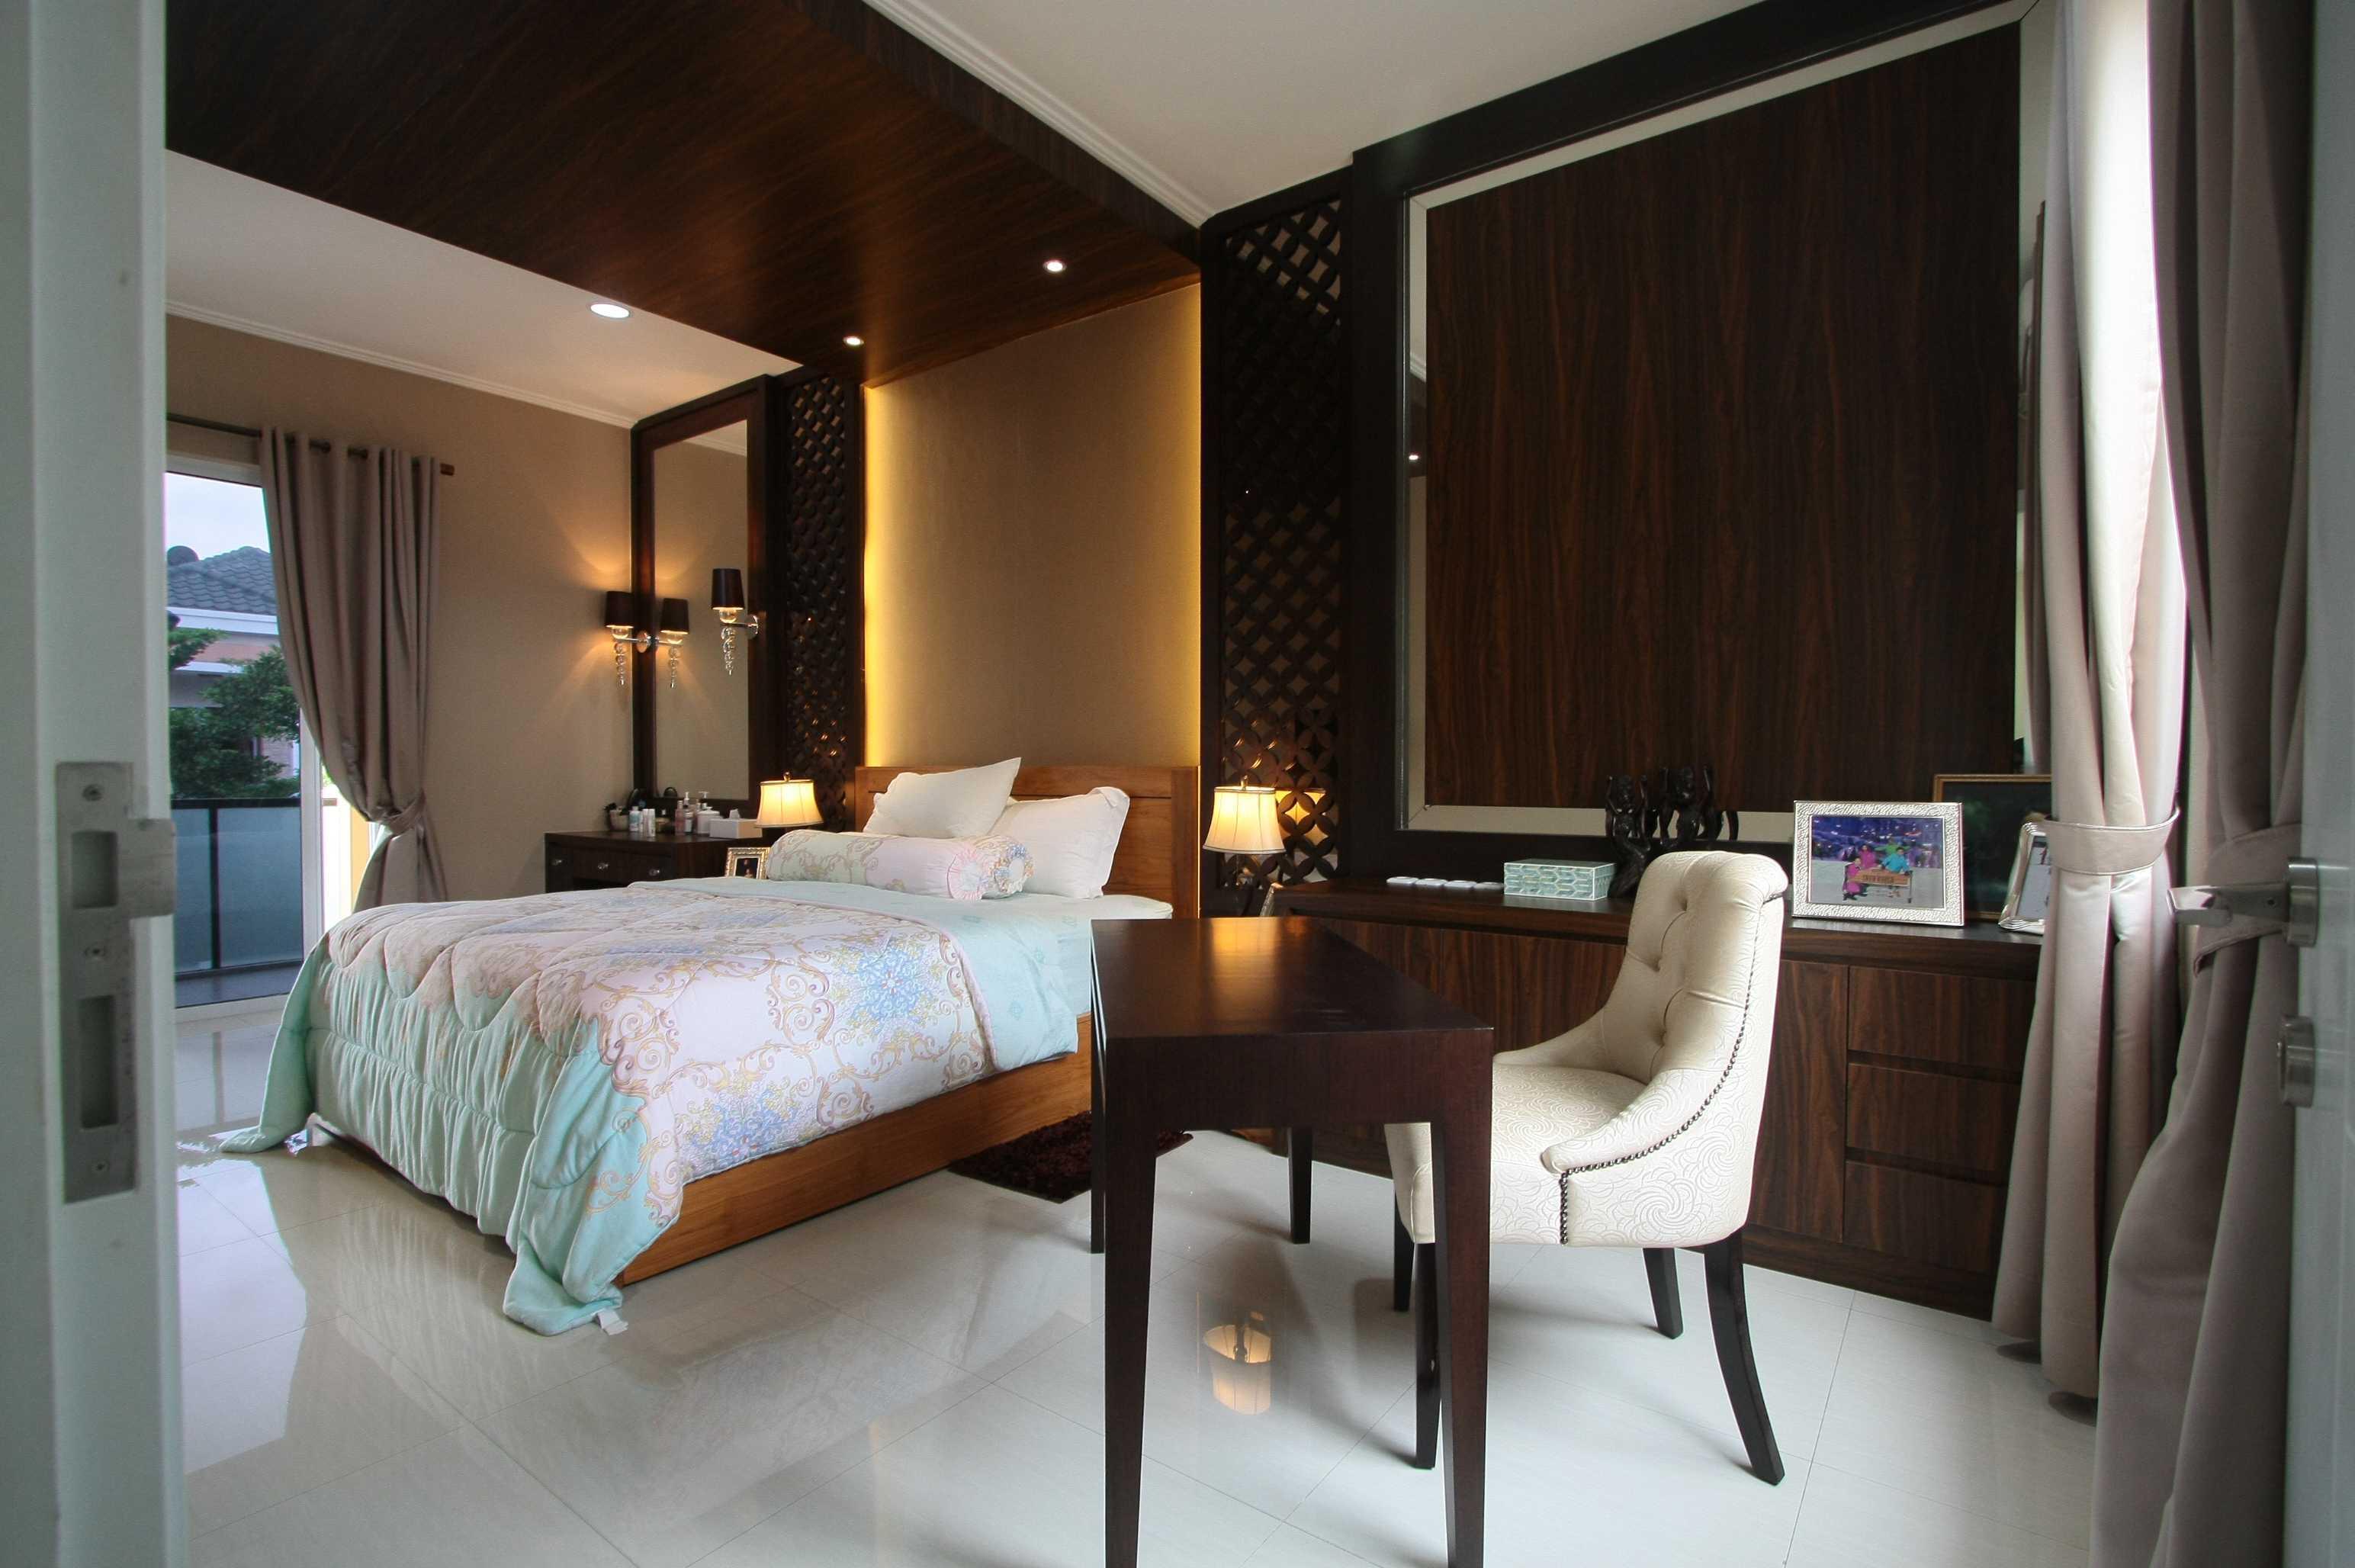 Exxo Interior Grand Galaxy Residence Bekasi Bekasi Master Bedroom   28114